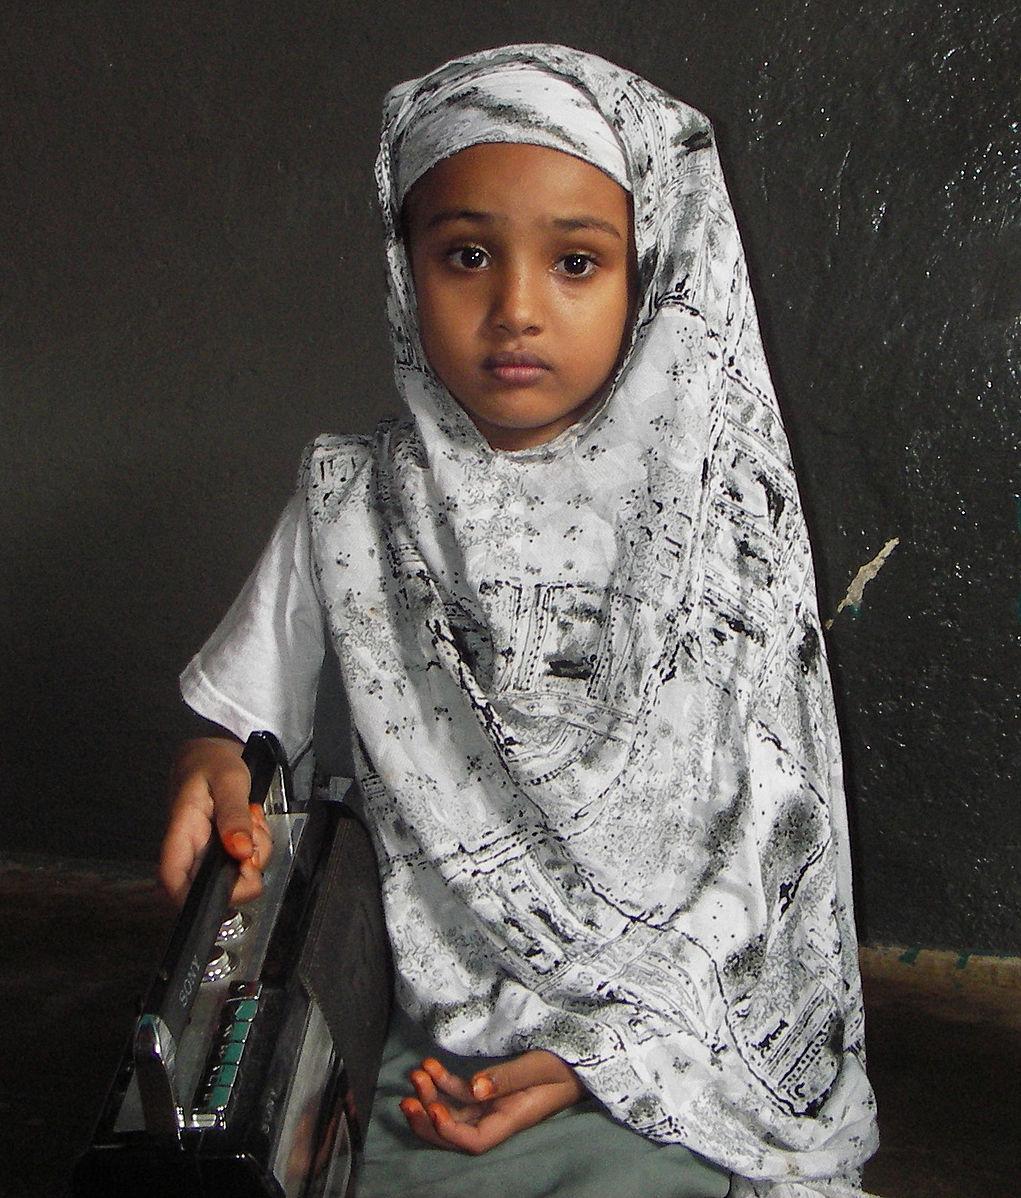 NIIKO    GIRLS         COMF SOMALIA XVVIDEOS